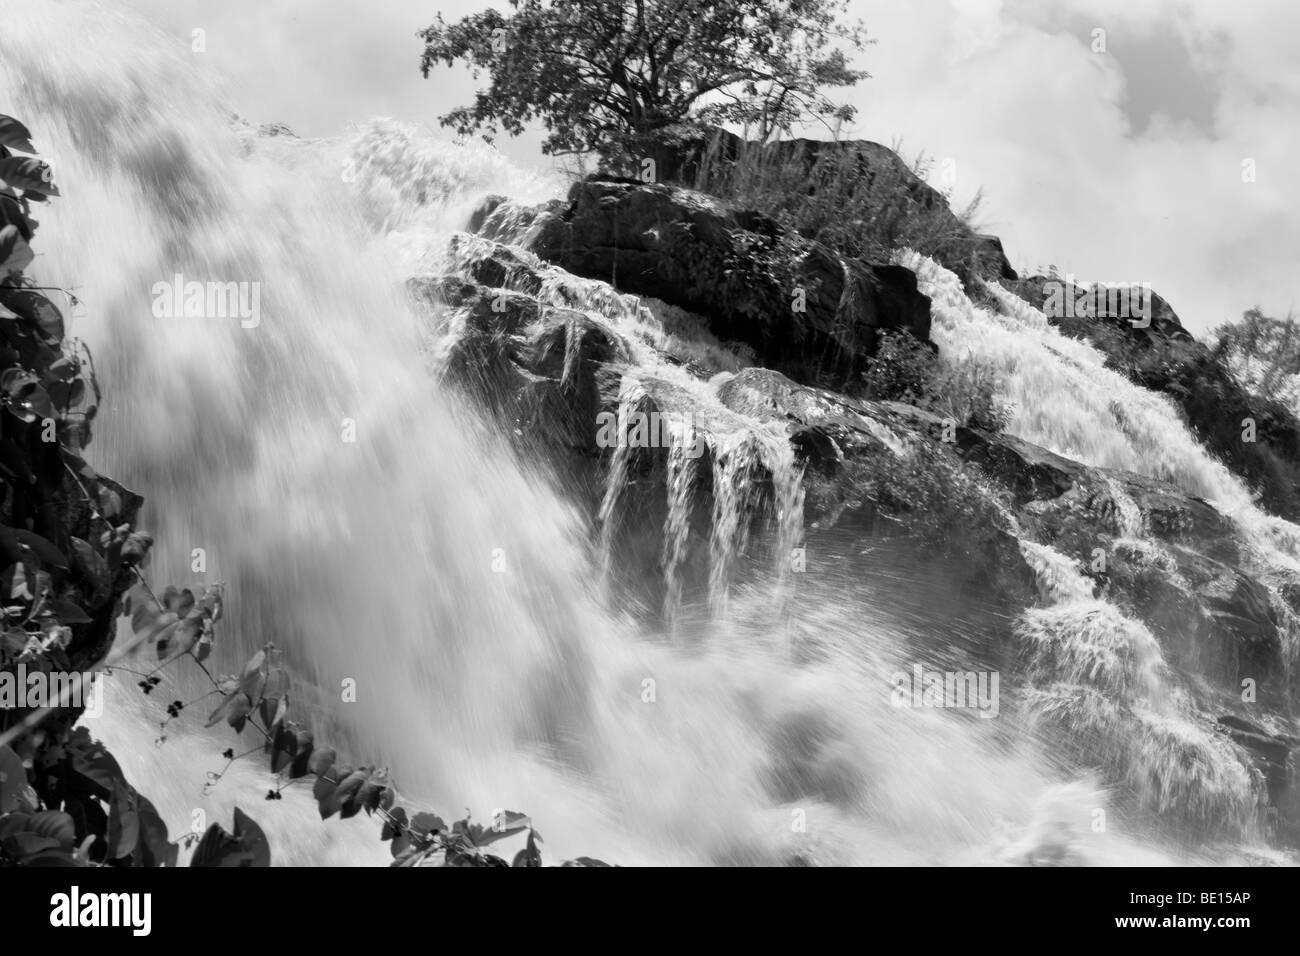 The impressive Gurara Falls, on the Gurara River in Nigeria's Niger State, is 200 meters wide boasting a sheer - Stock Image